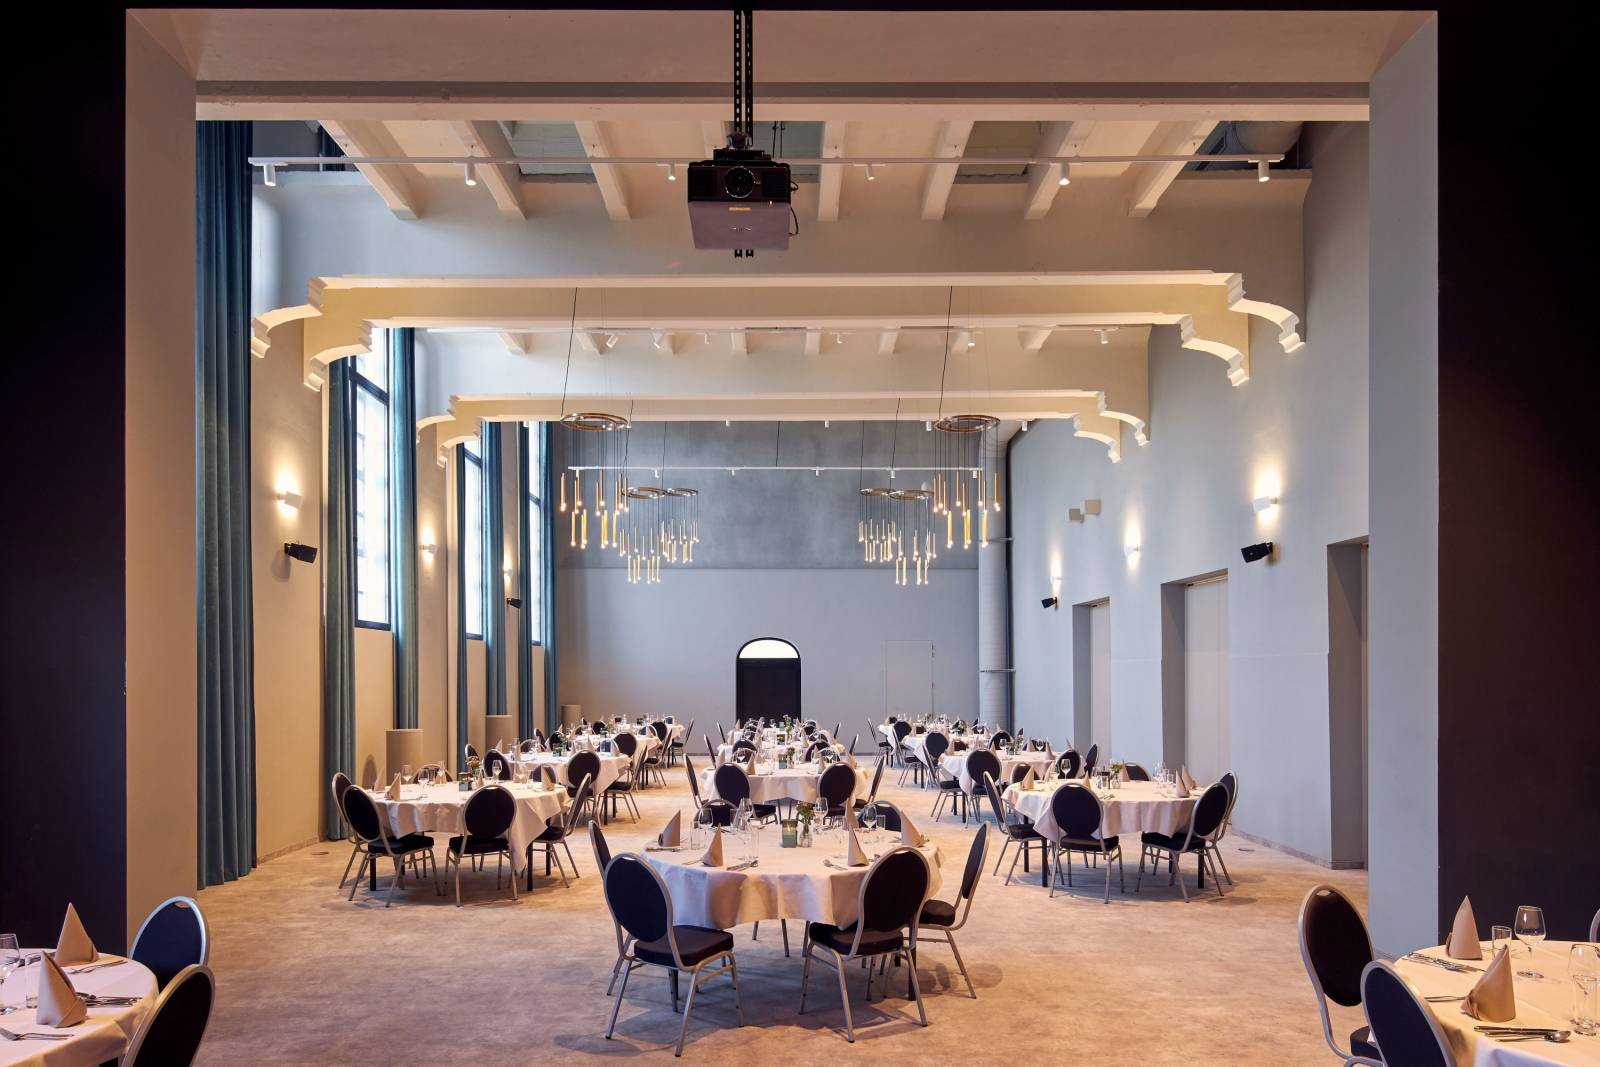 Feestal - Van der Valk hotel Mechelen - House of Weddings (3)